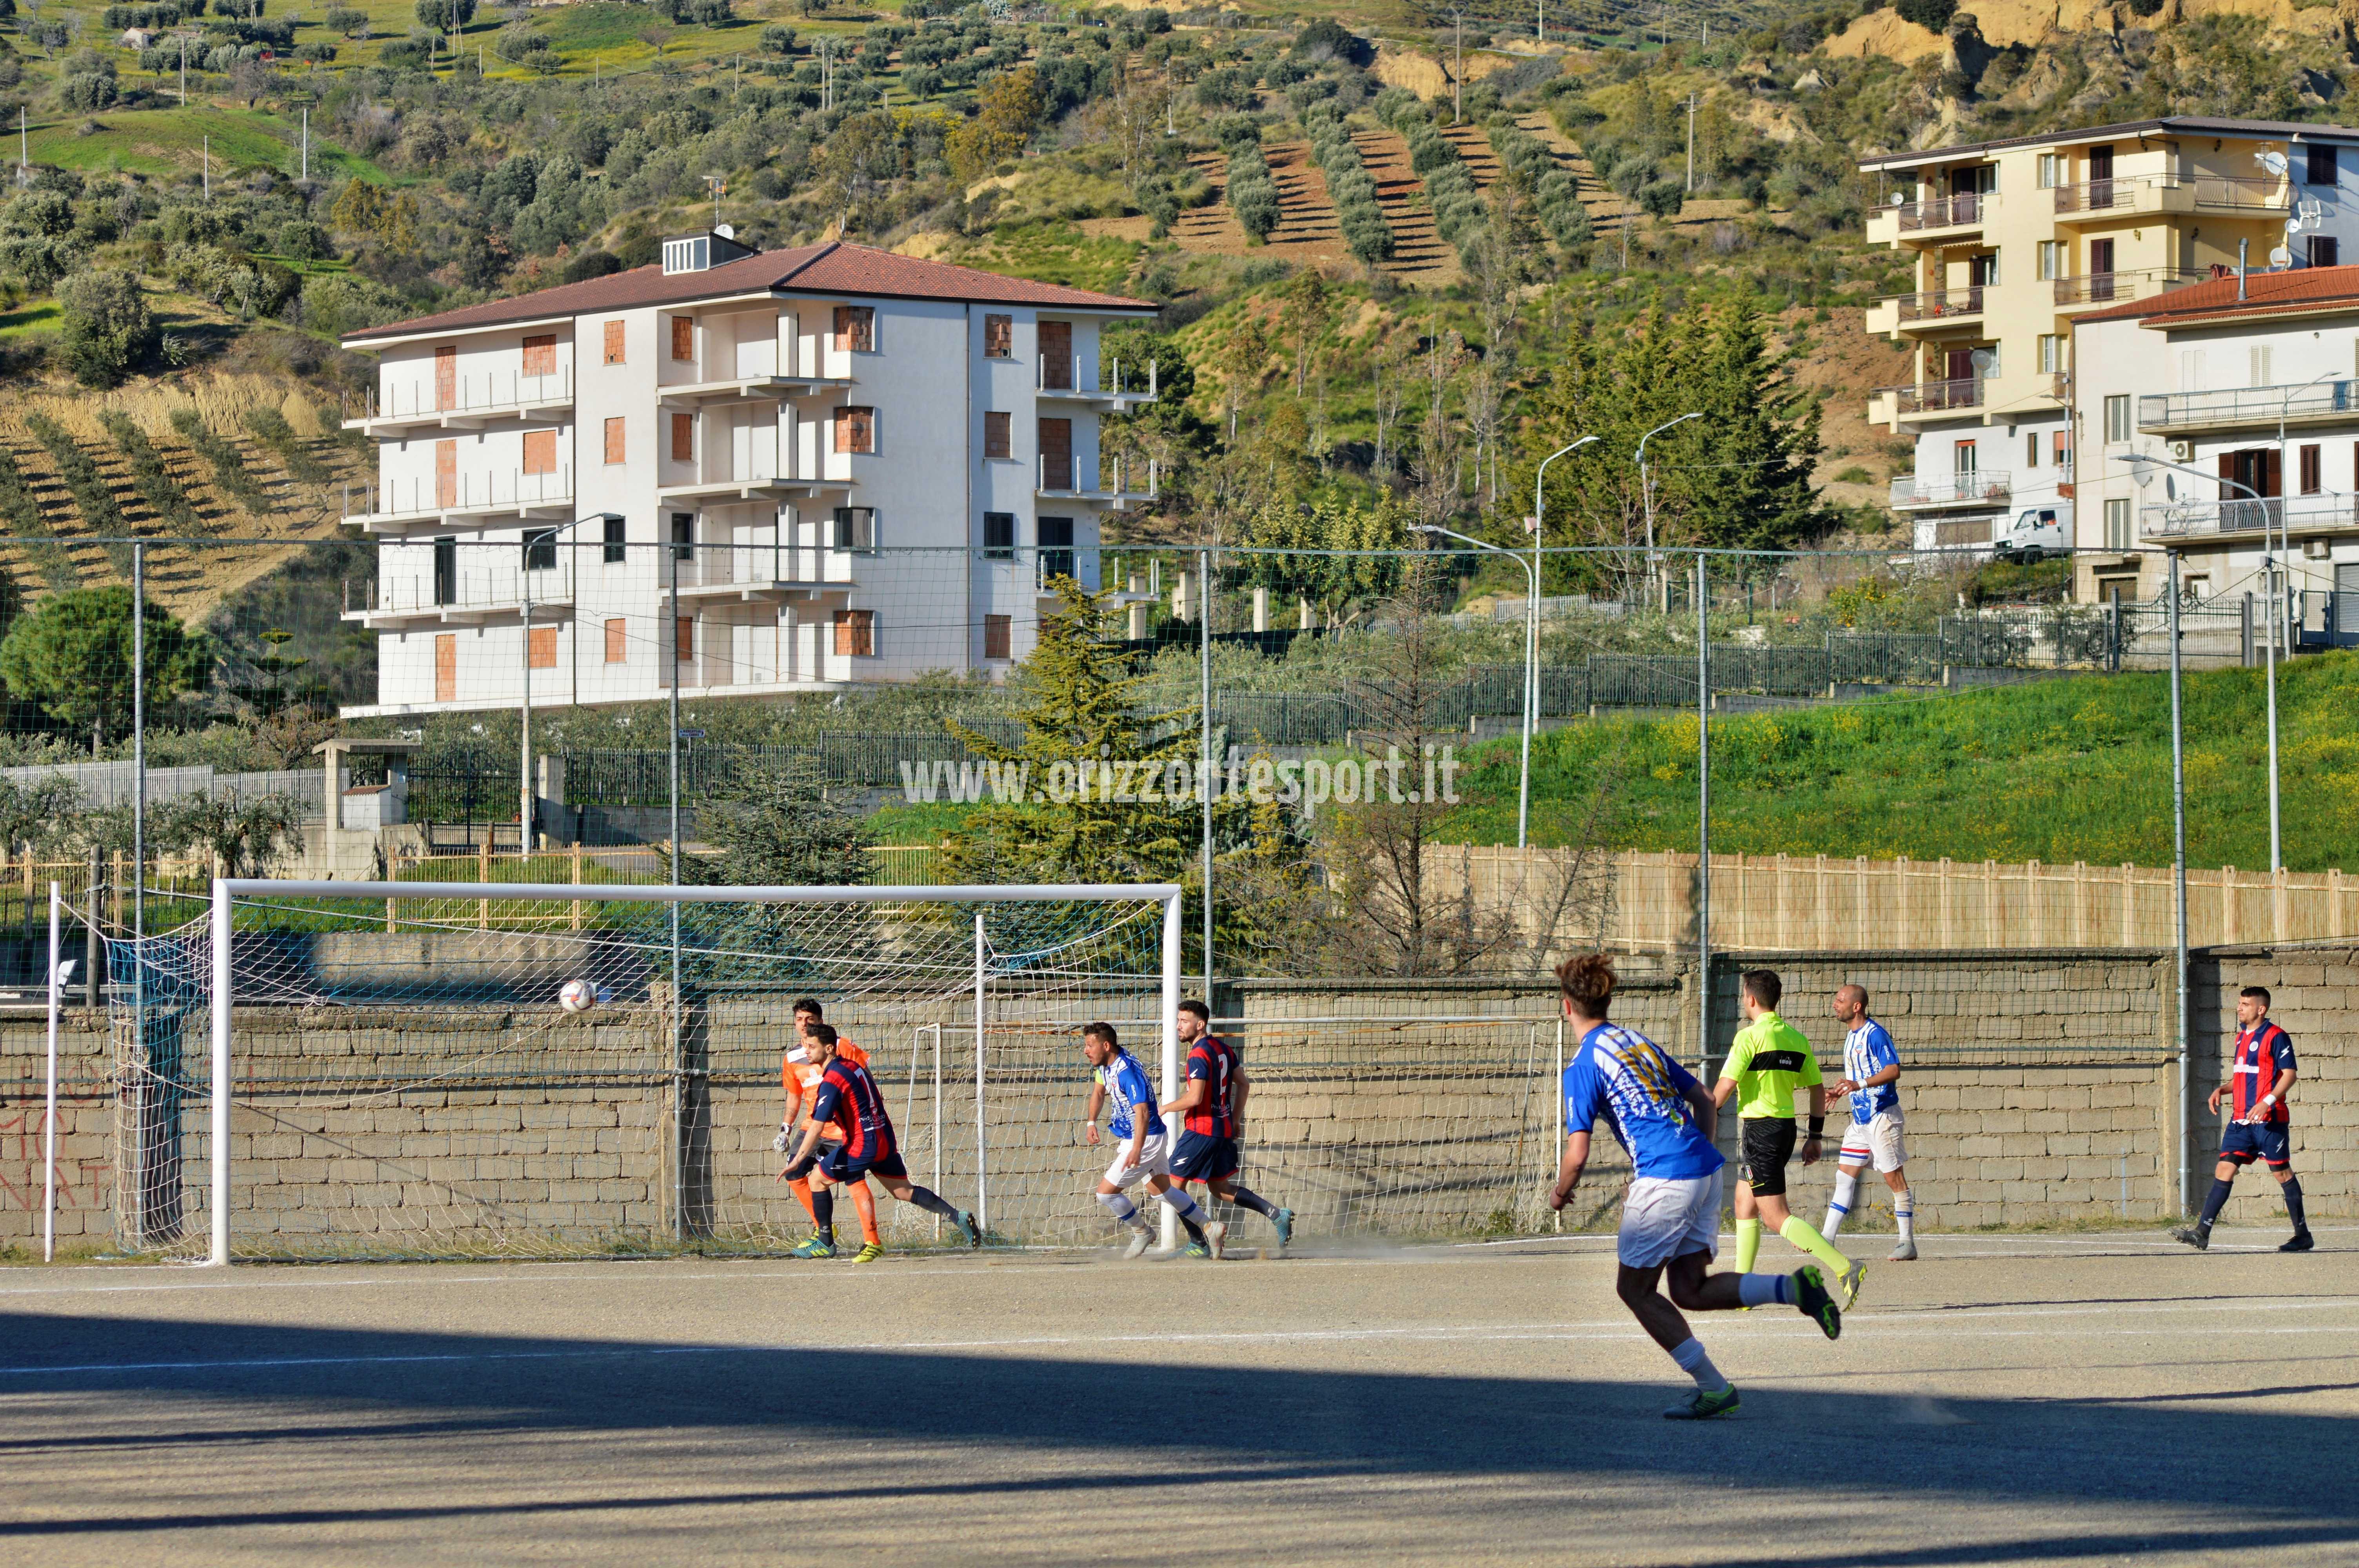 cassano_rossanese (148)